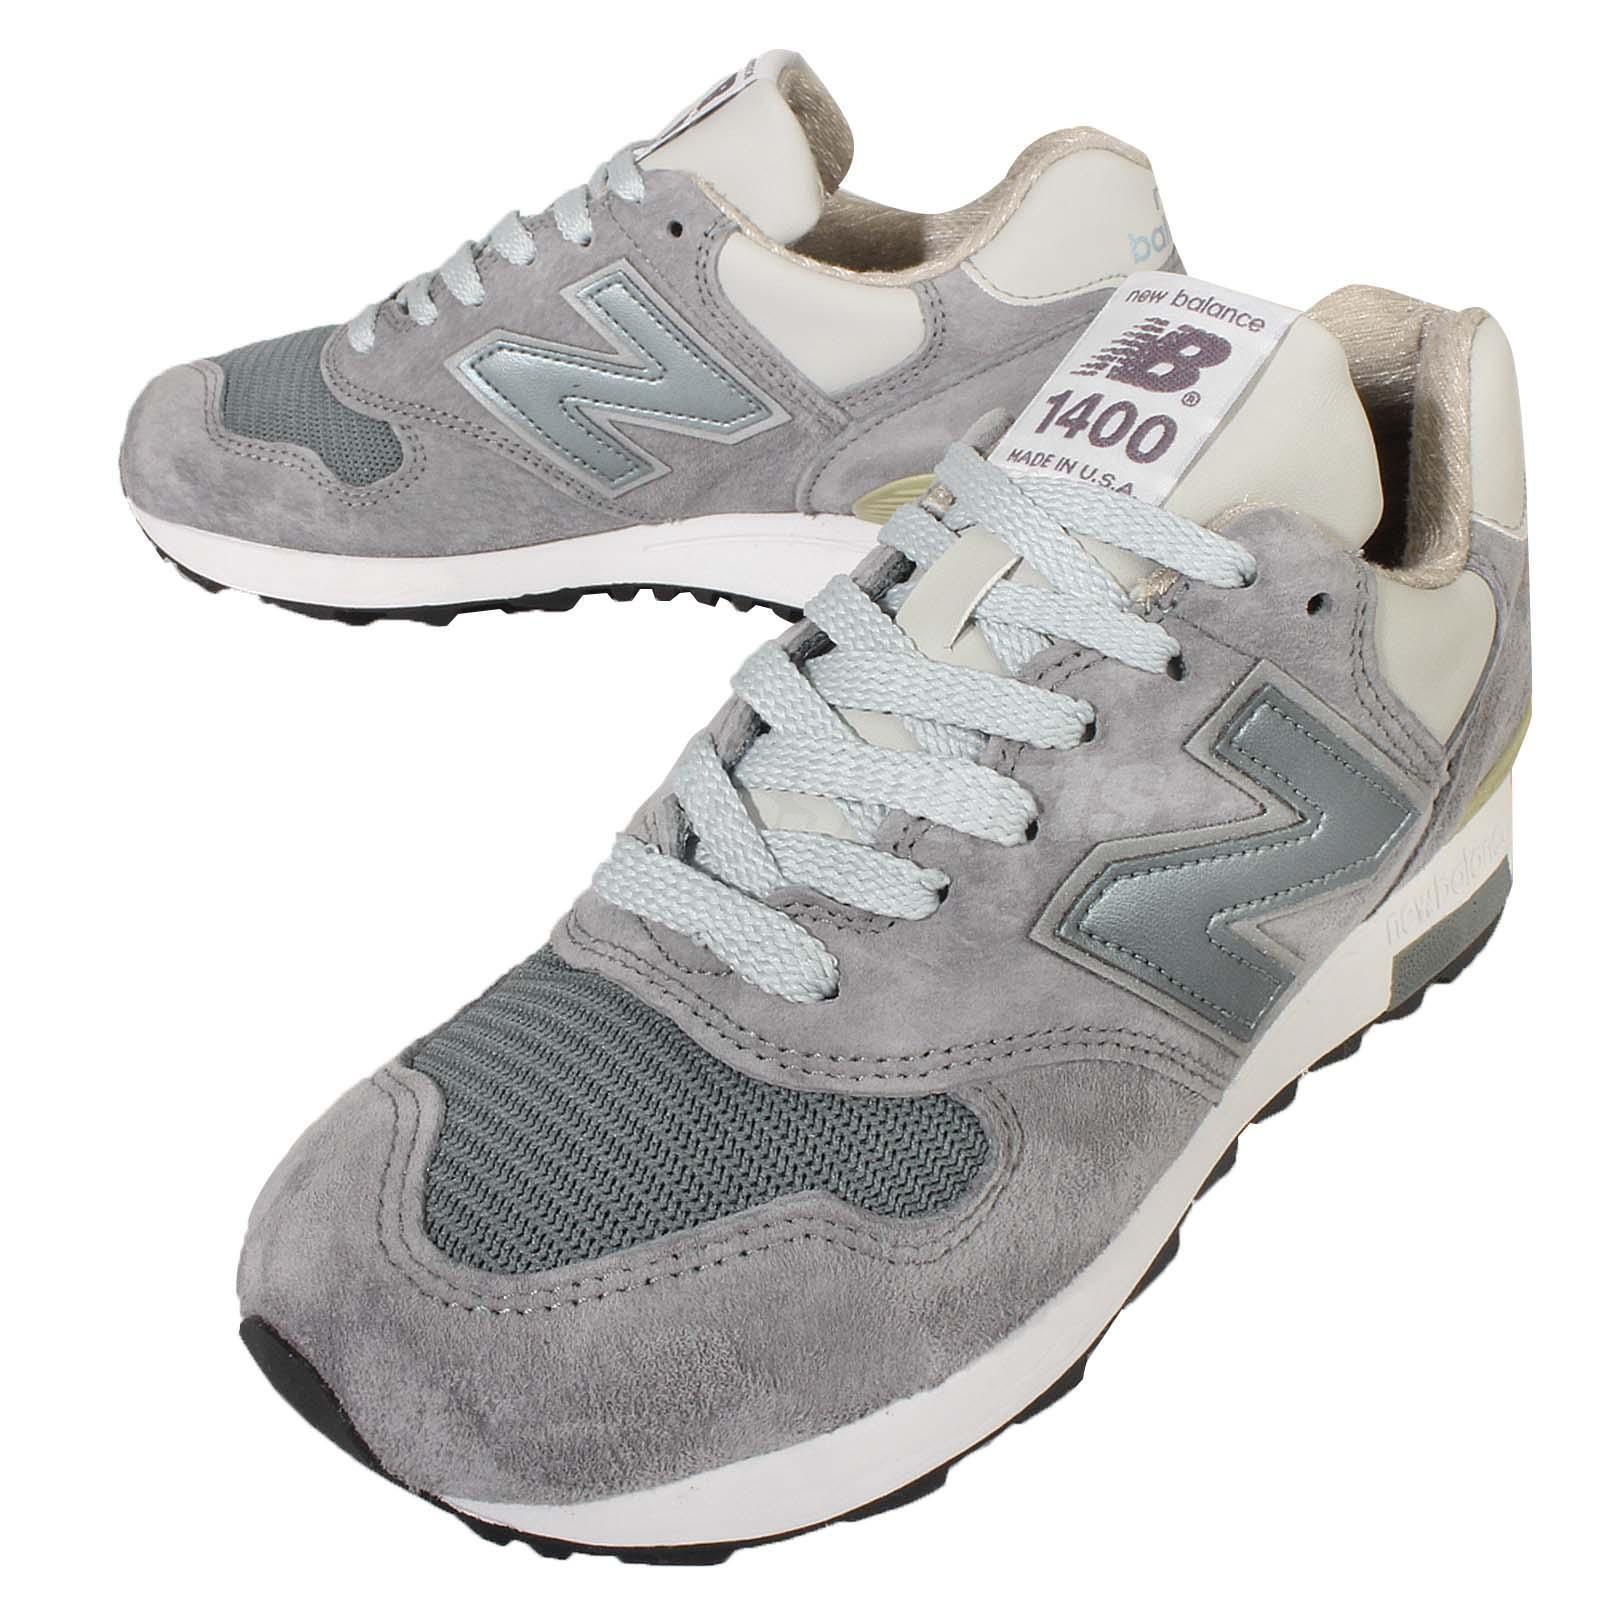 New Balance Running M1400 D Made In USA Mens Running Balance Chaussures Baskets Pick 1 1dca36